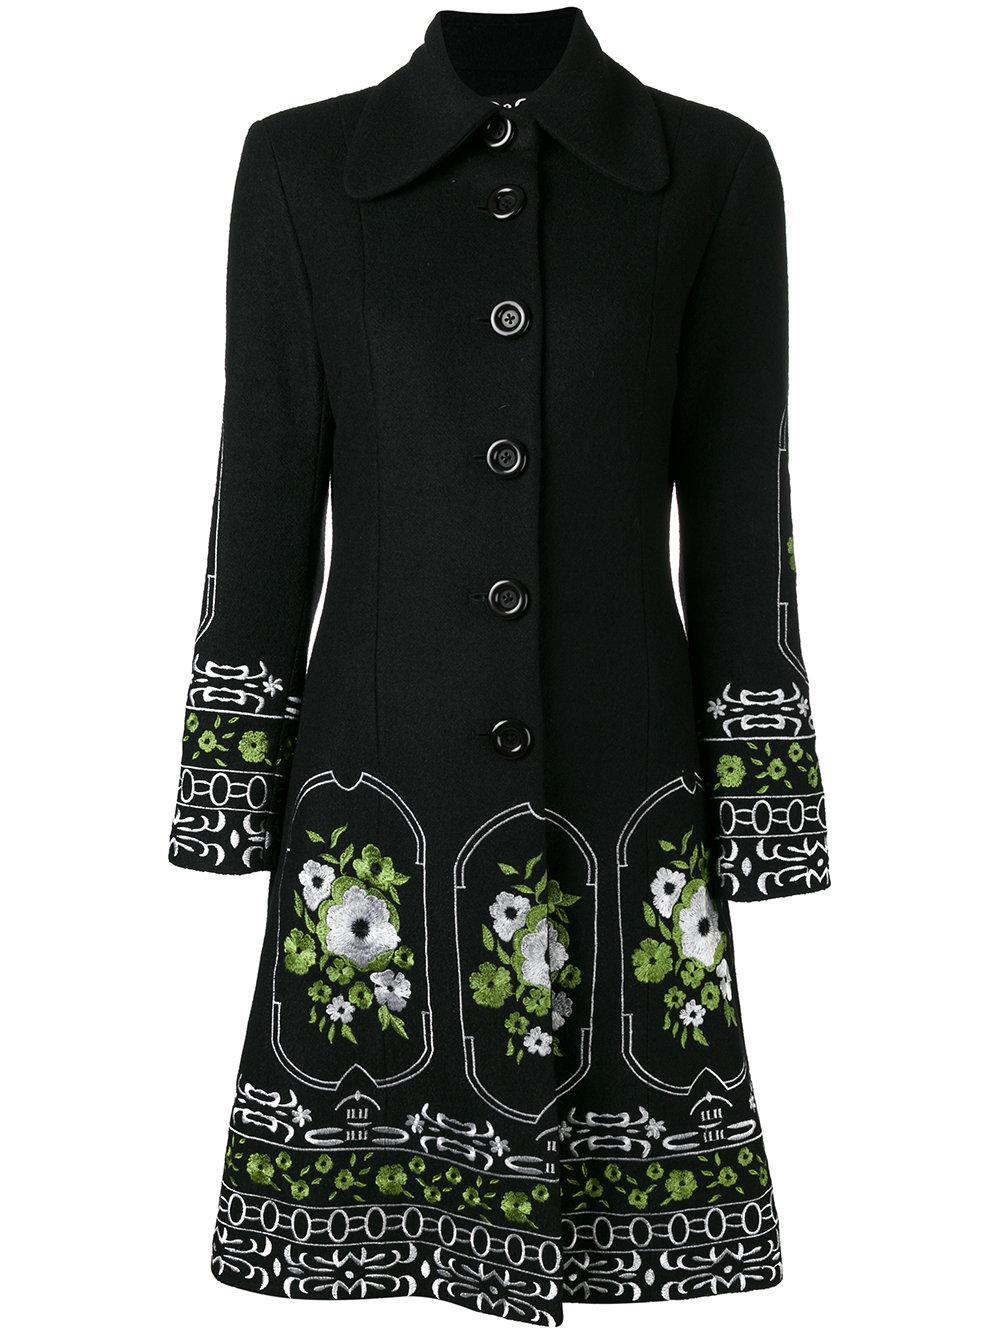 Dolce Amp Gabbana Flower Embroidered Coat In Black Lyst